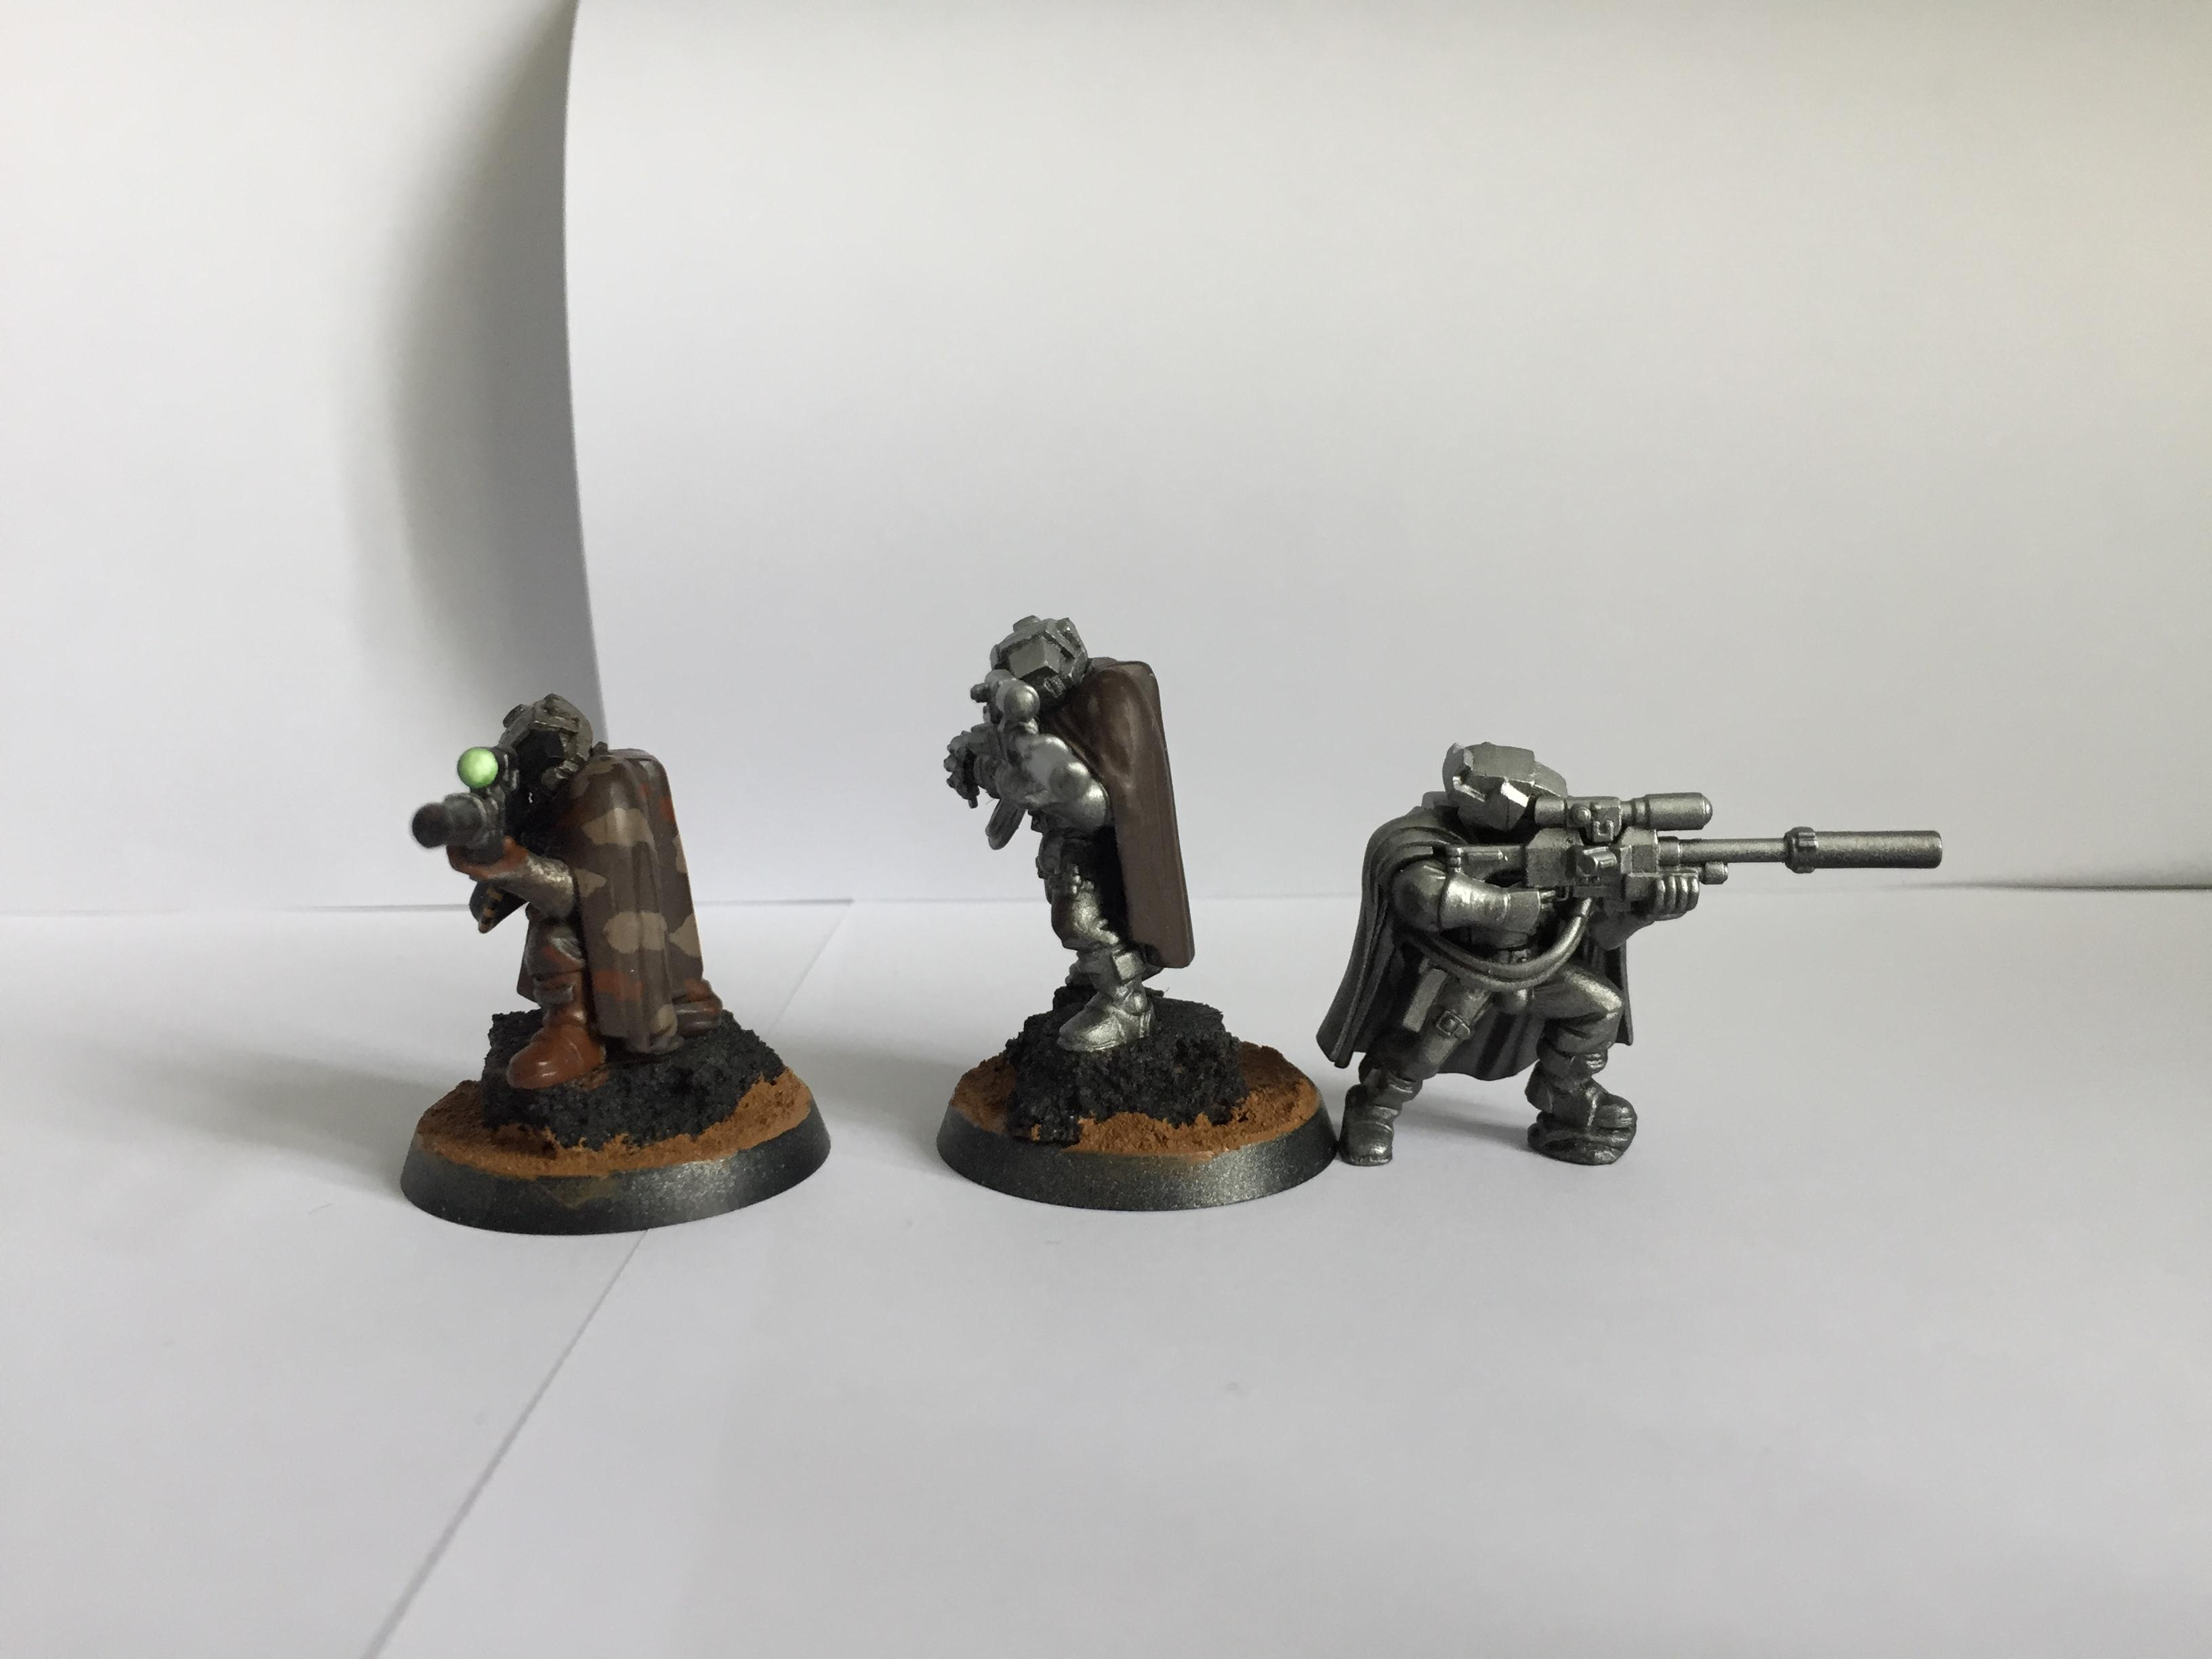 Iron Warriors, Pre Heresy, Preheresy, Reconnaissance Marines, Scout Armour, Sniper Rifles